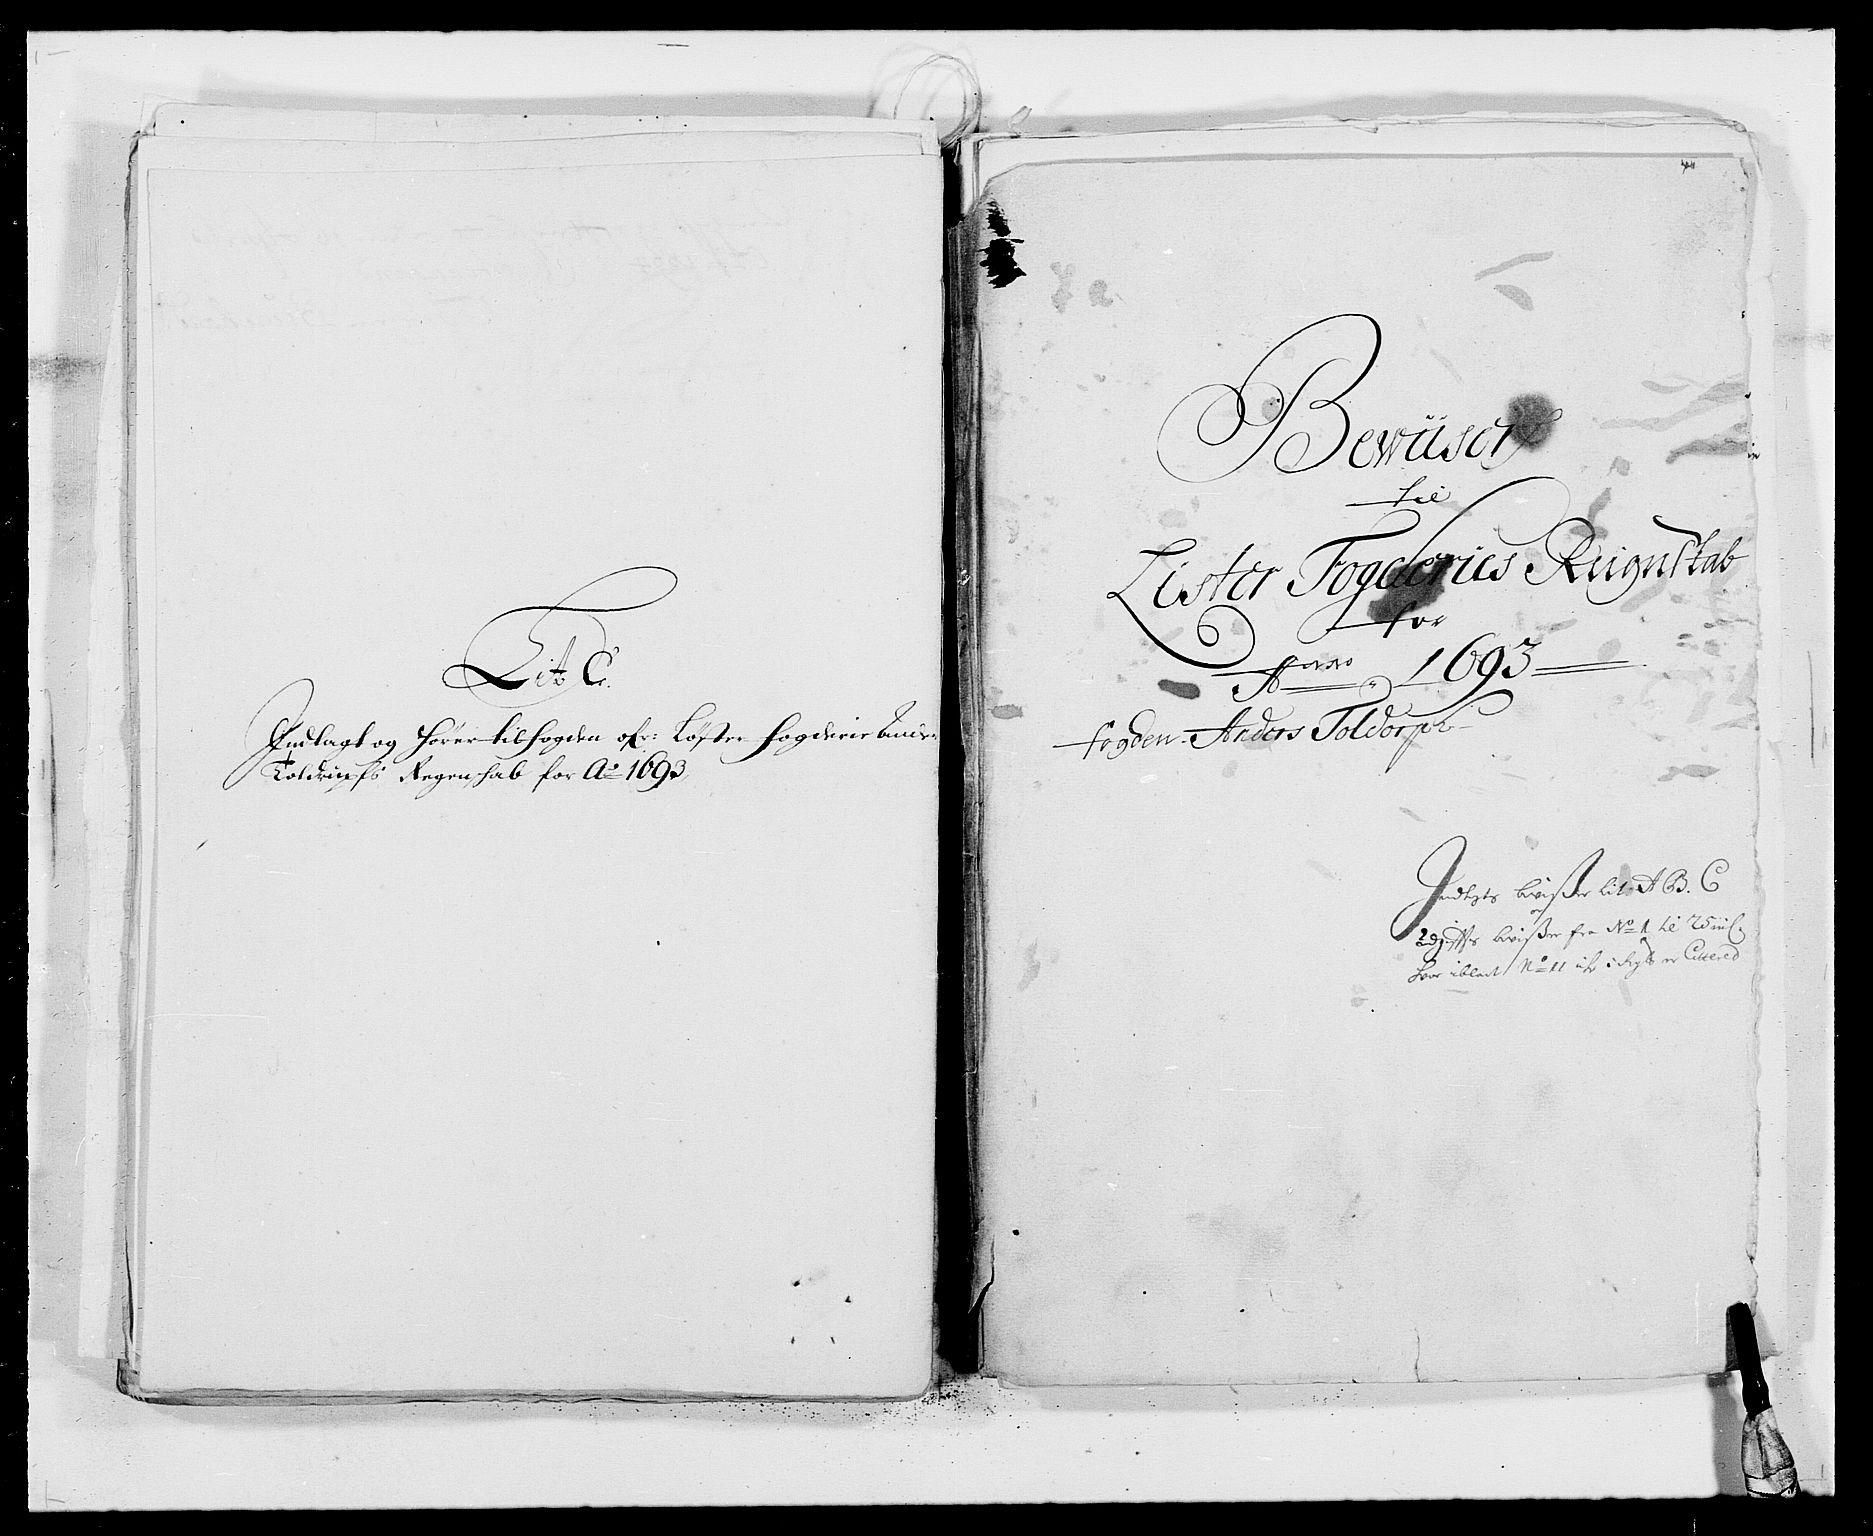 RA, Rentekammeret inntil 1814, Reviderte regnskaper, Fogderegnskap, R41/L2536: Fogderegnskap Lista, 1690-1693, s. 452